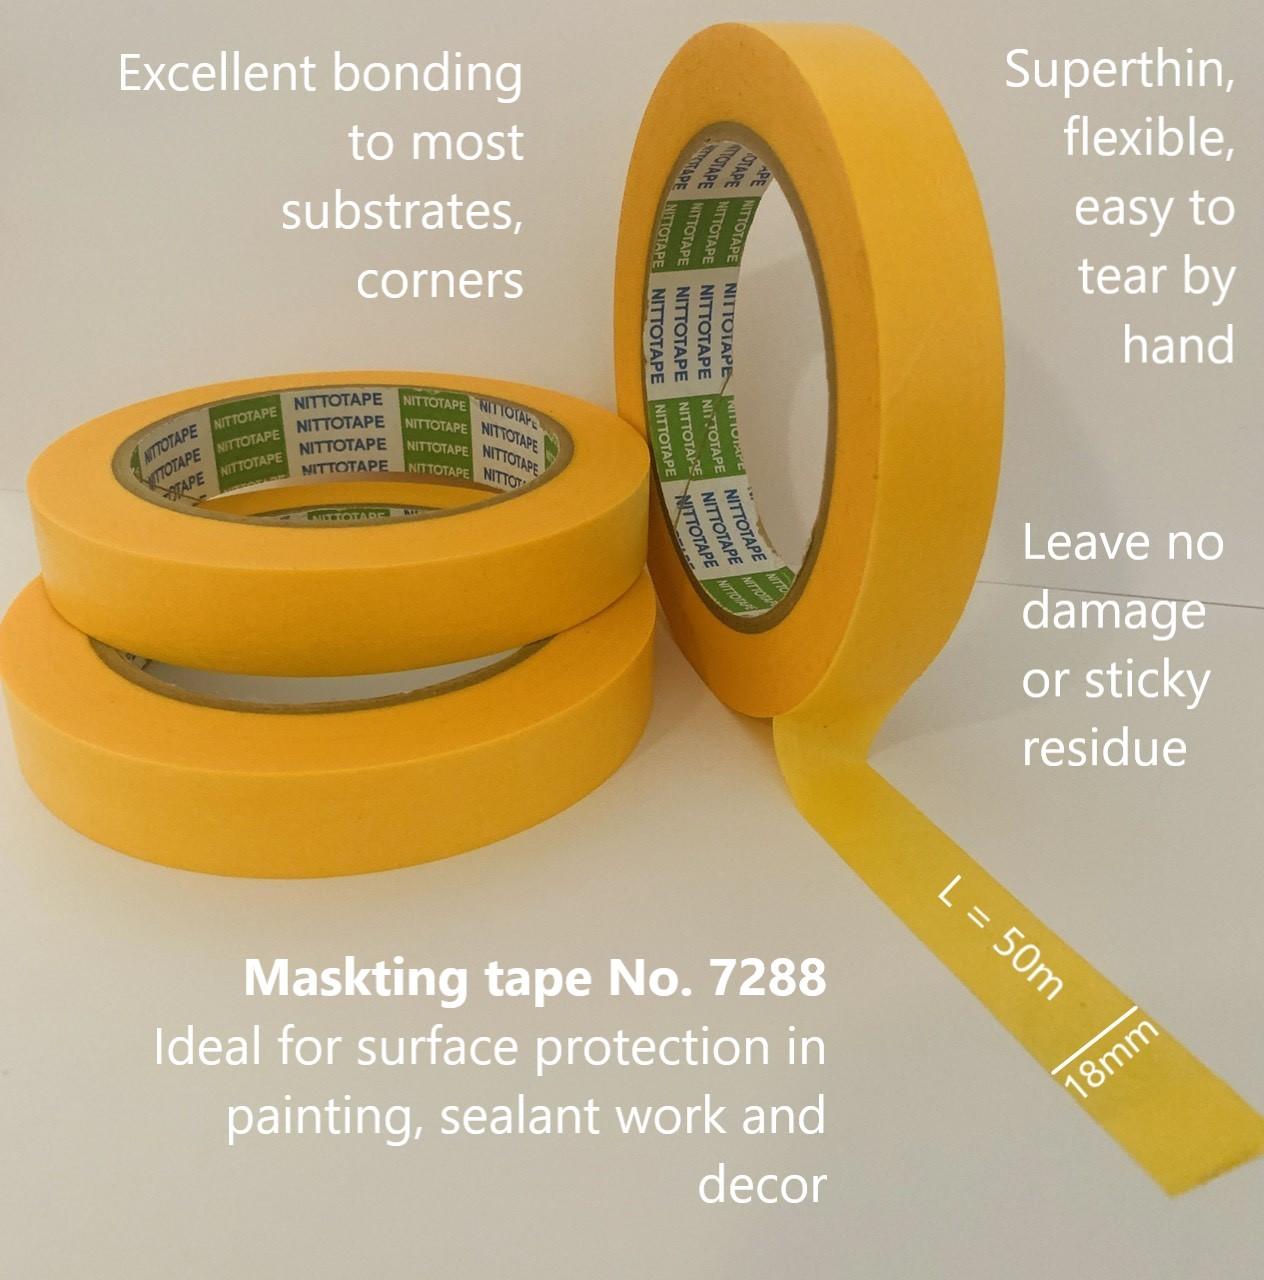 No 7288 masking tape. ok